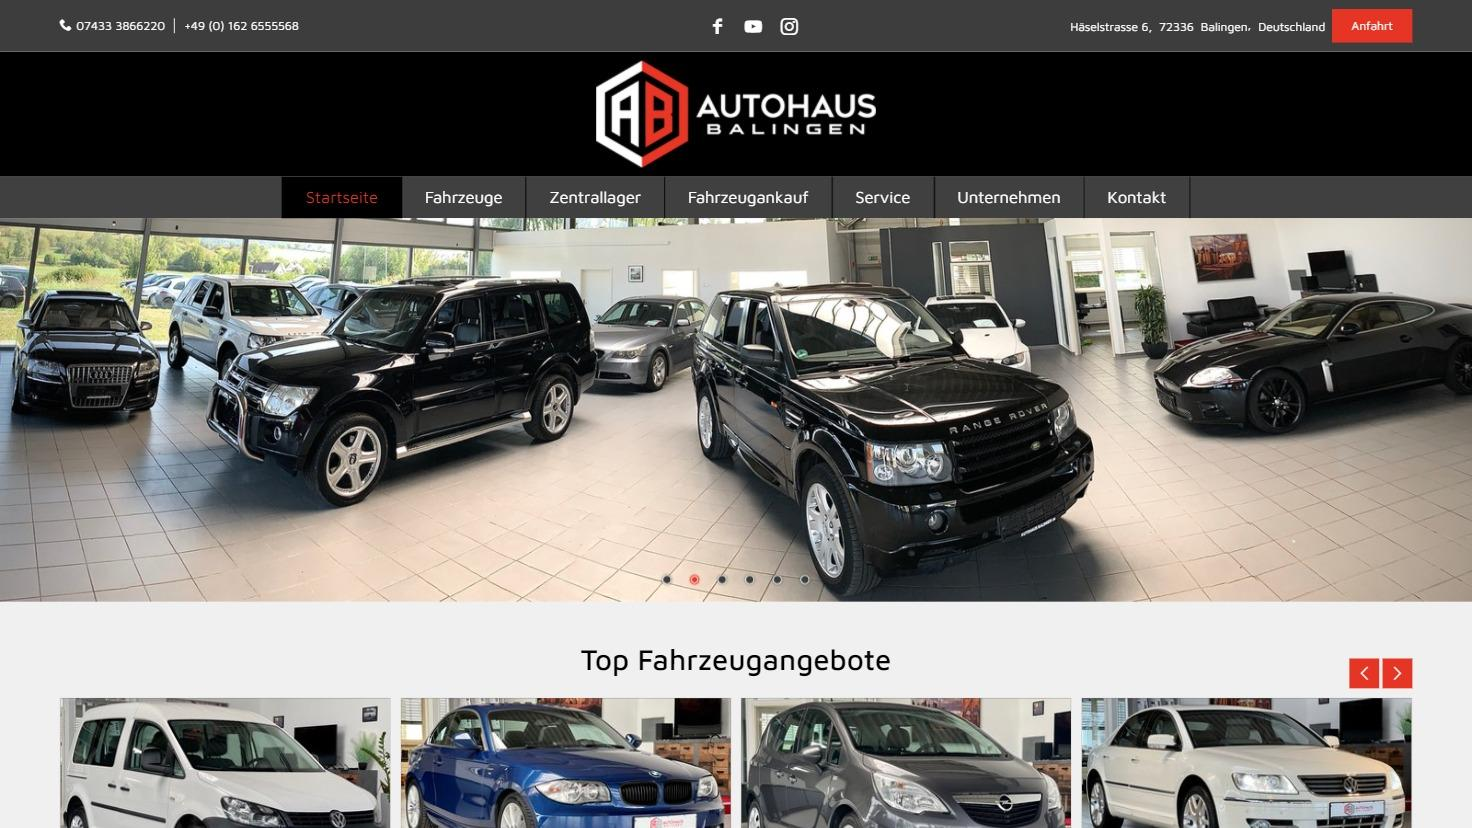 Autohaus Balingen - Gebrauchtwagenhändler in Balingen